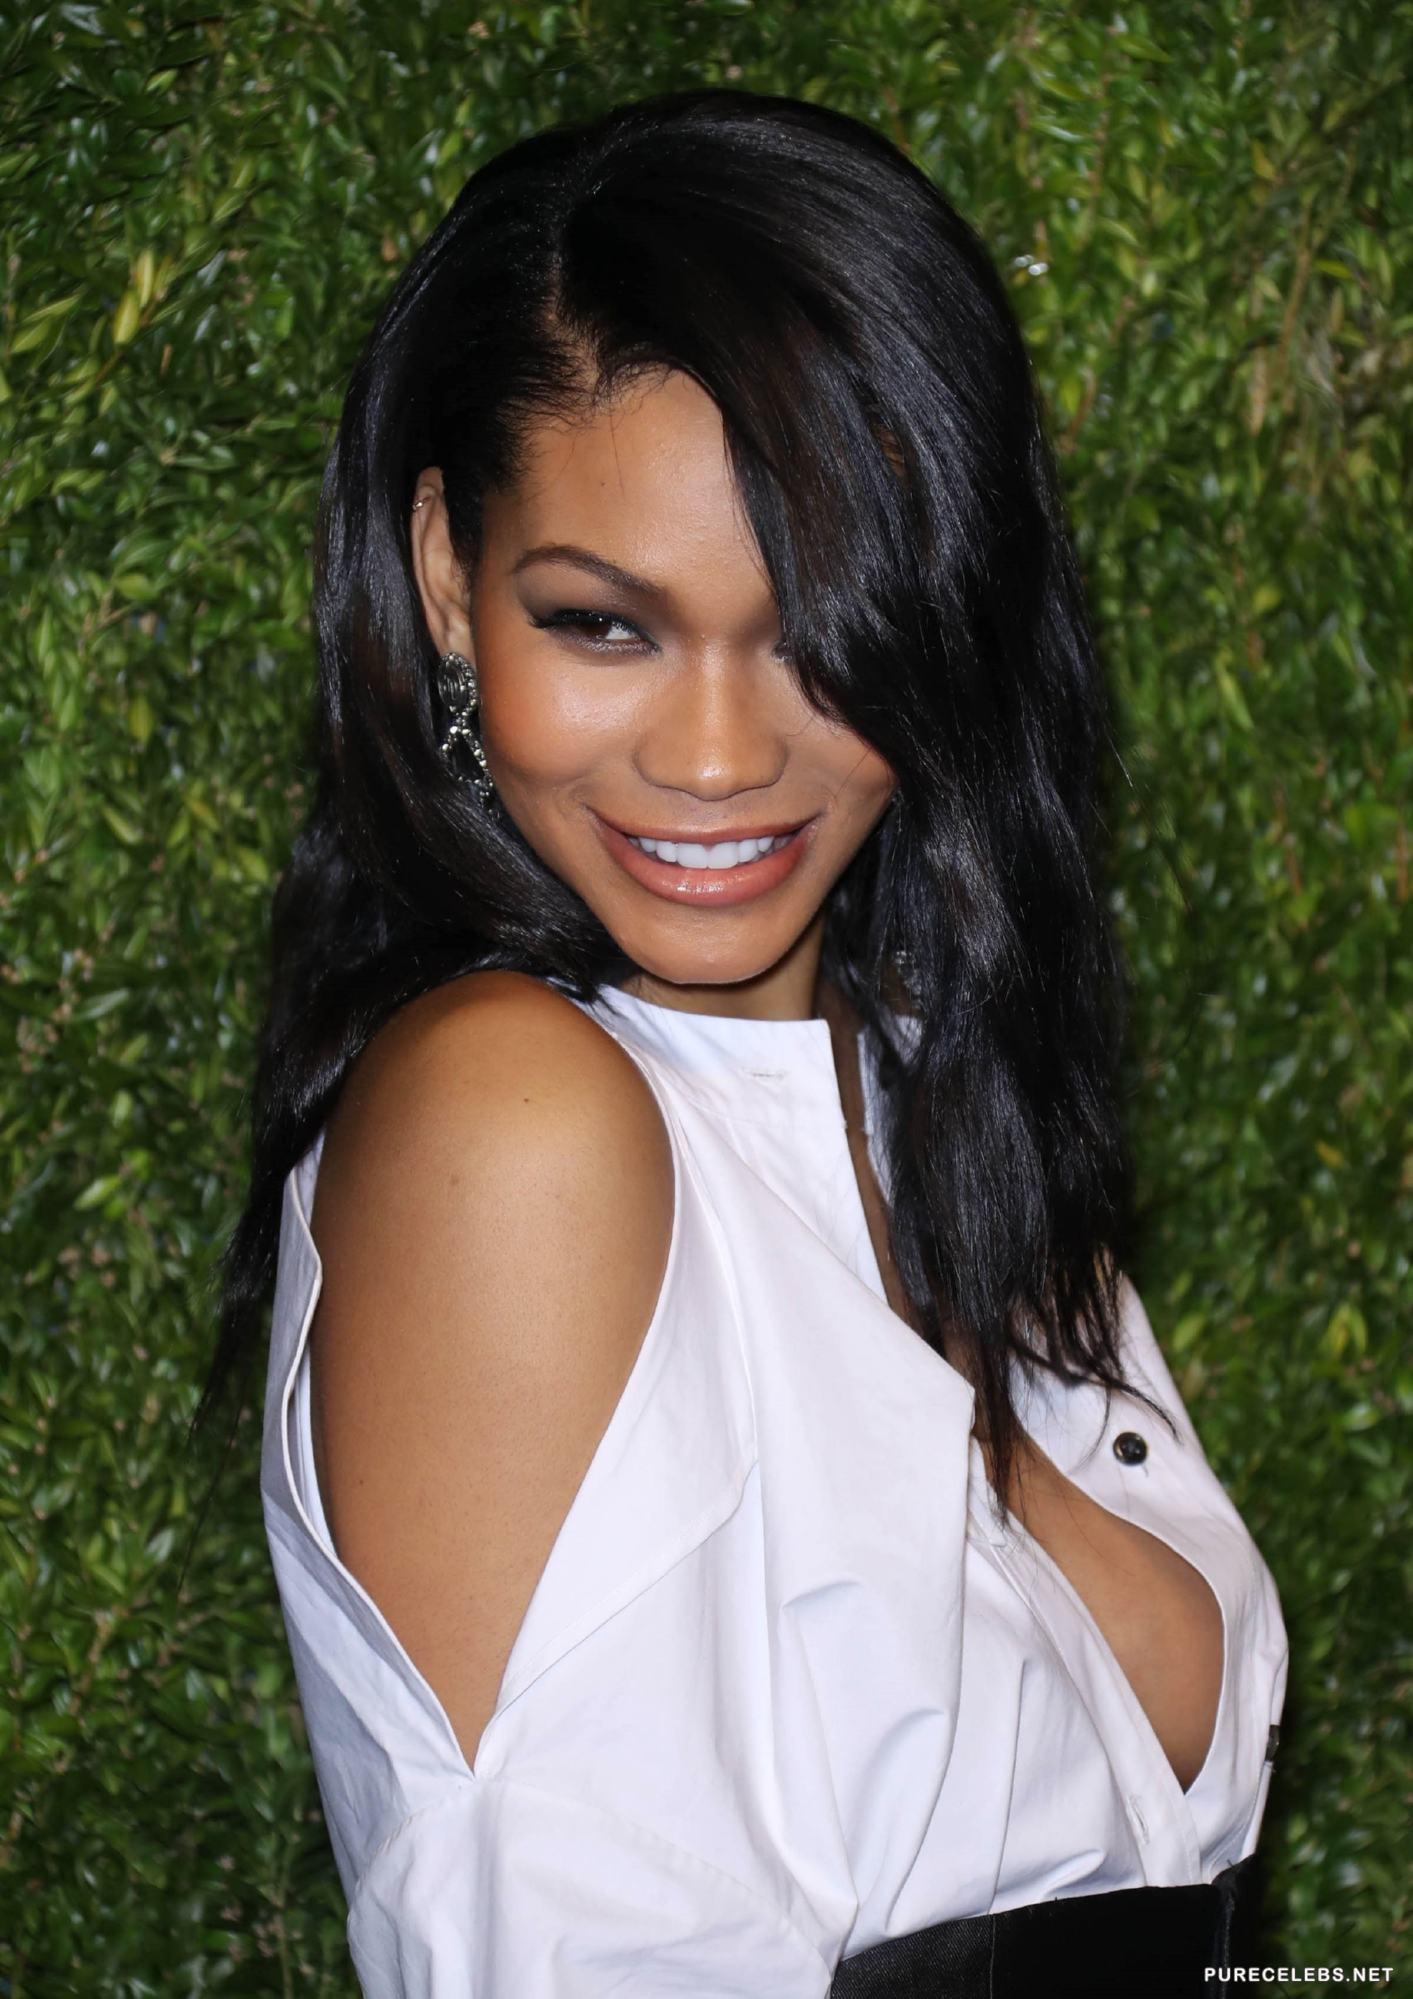 Chanel Iman Paparazzi Nipple Slip Shots - NuCelebs.com